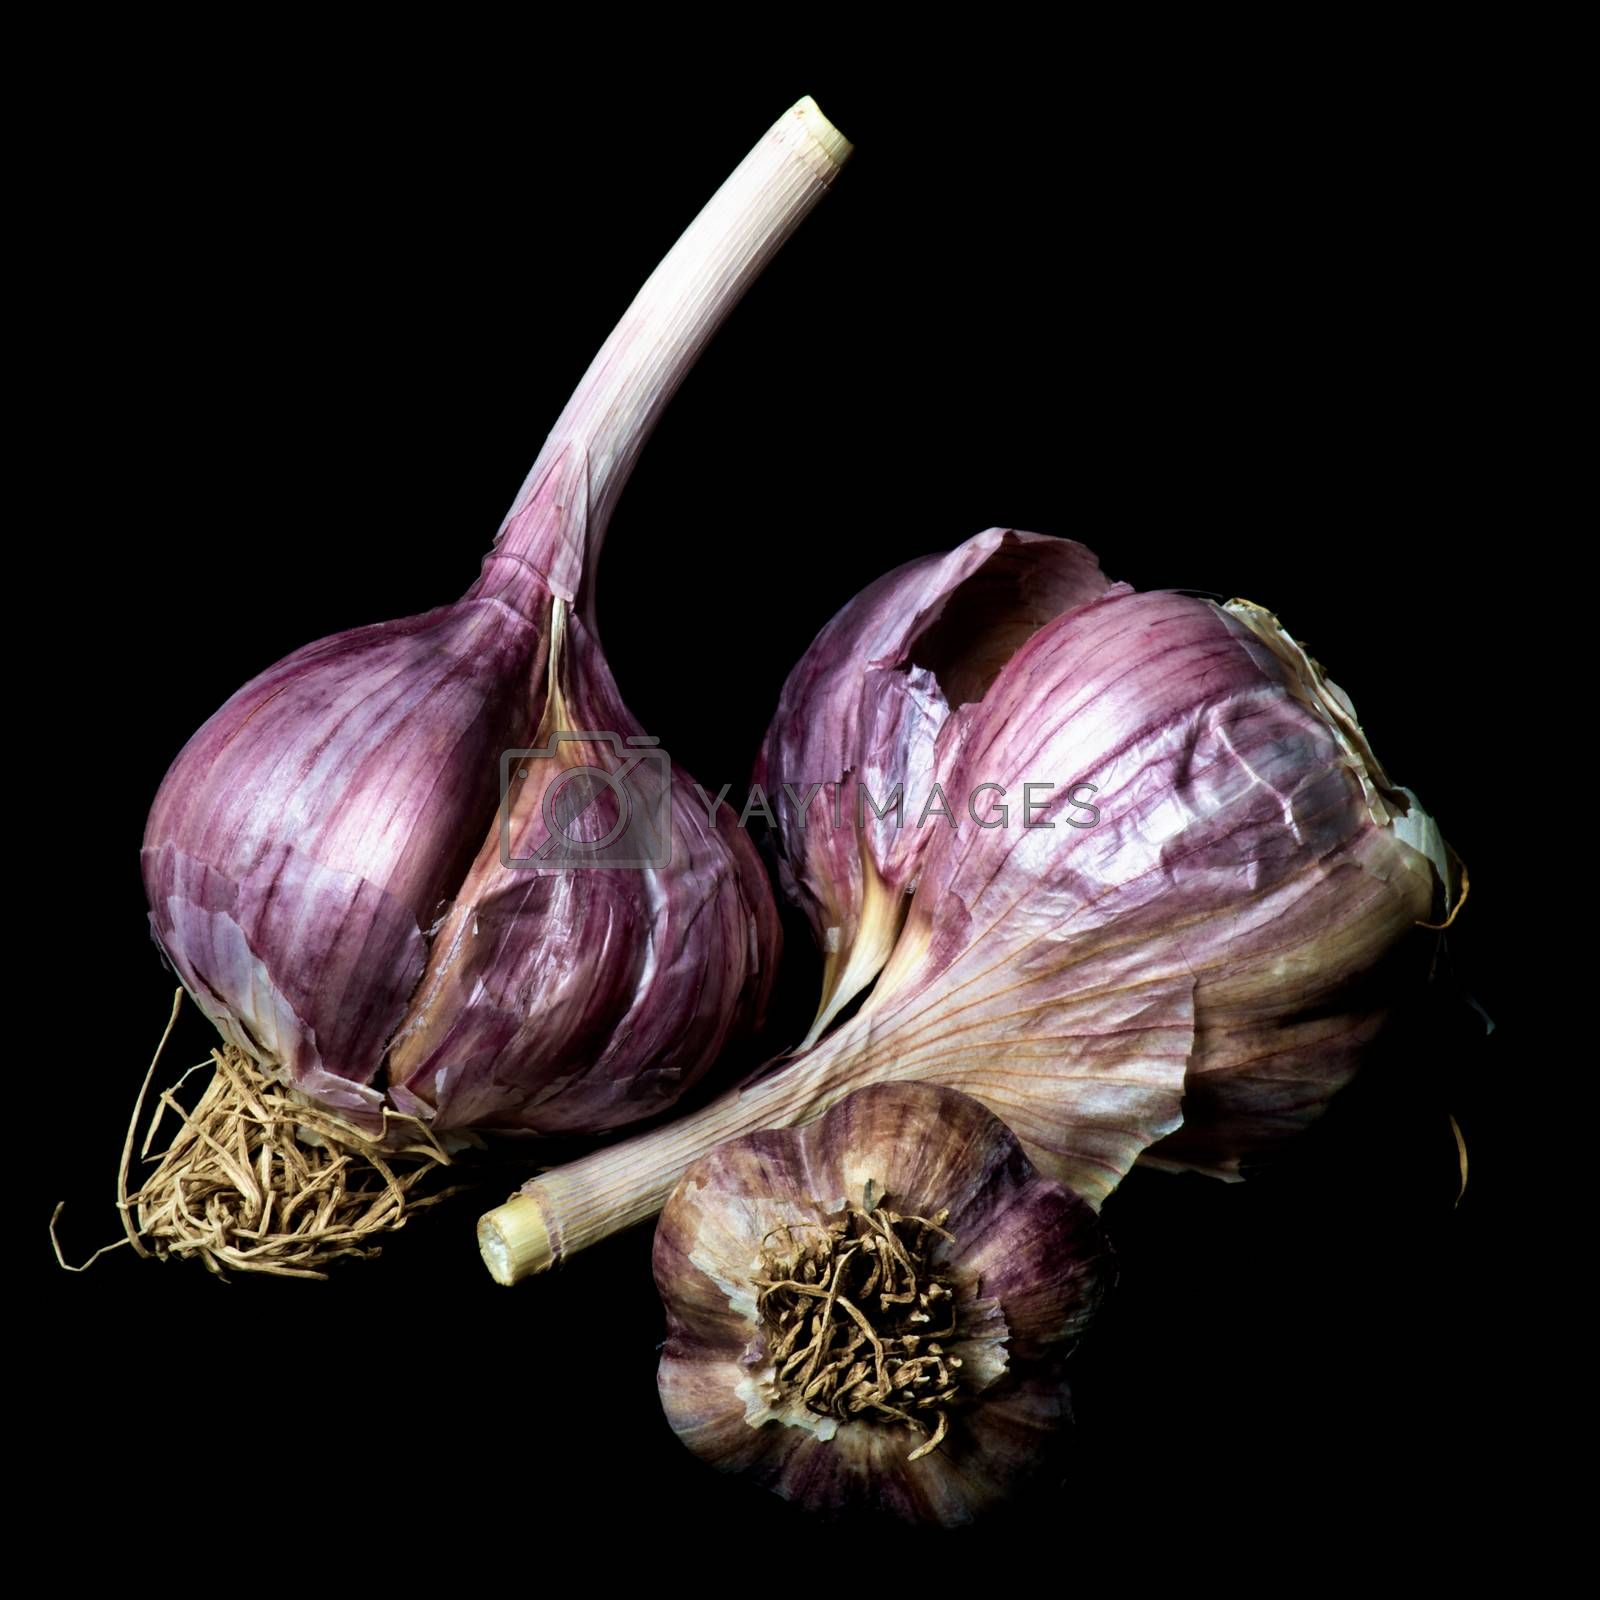 Ripe Dried Garlic Full Body isolated on Black background